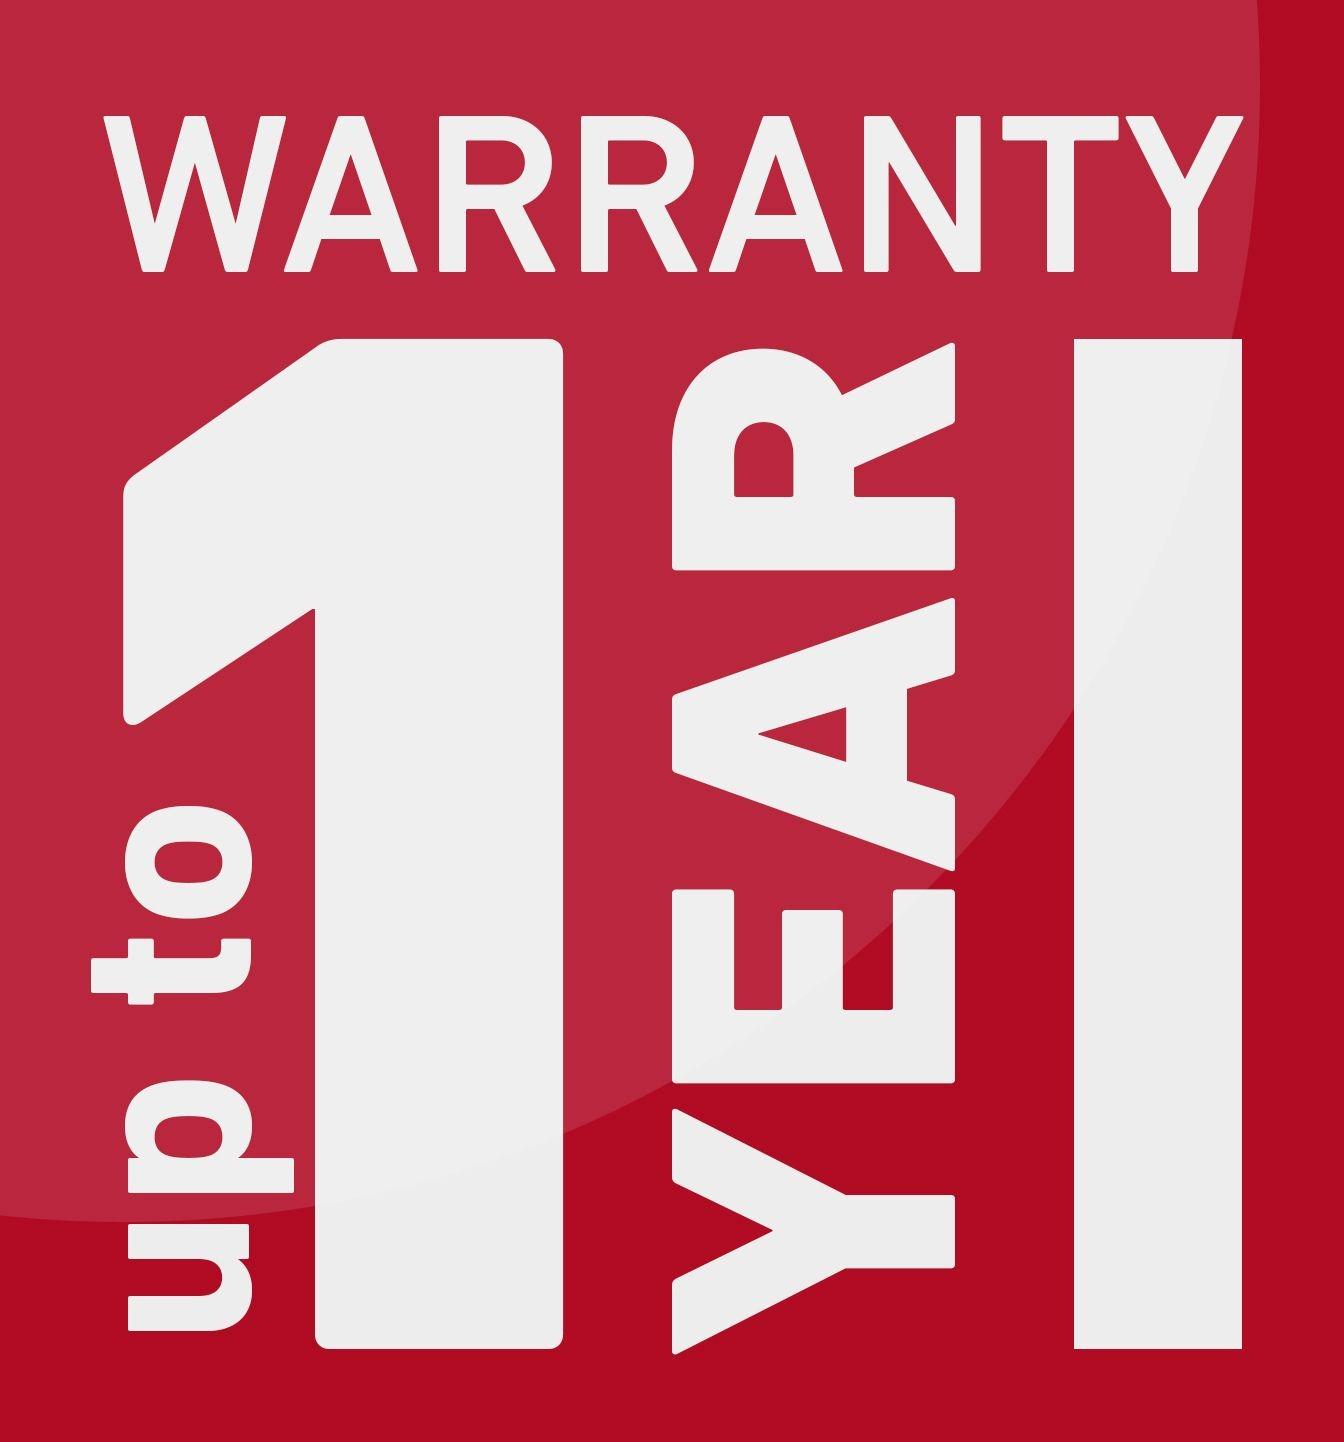 Precise France - Warranty 1 year